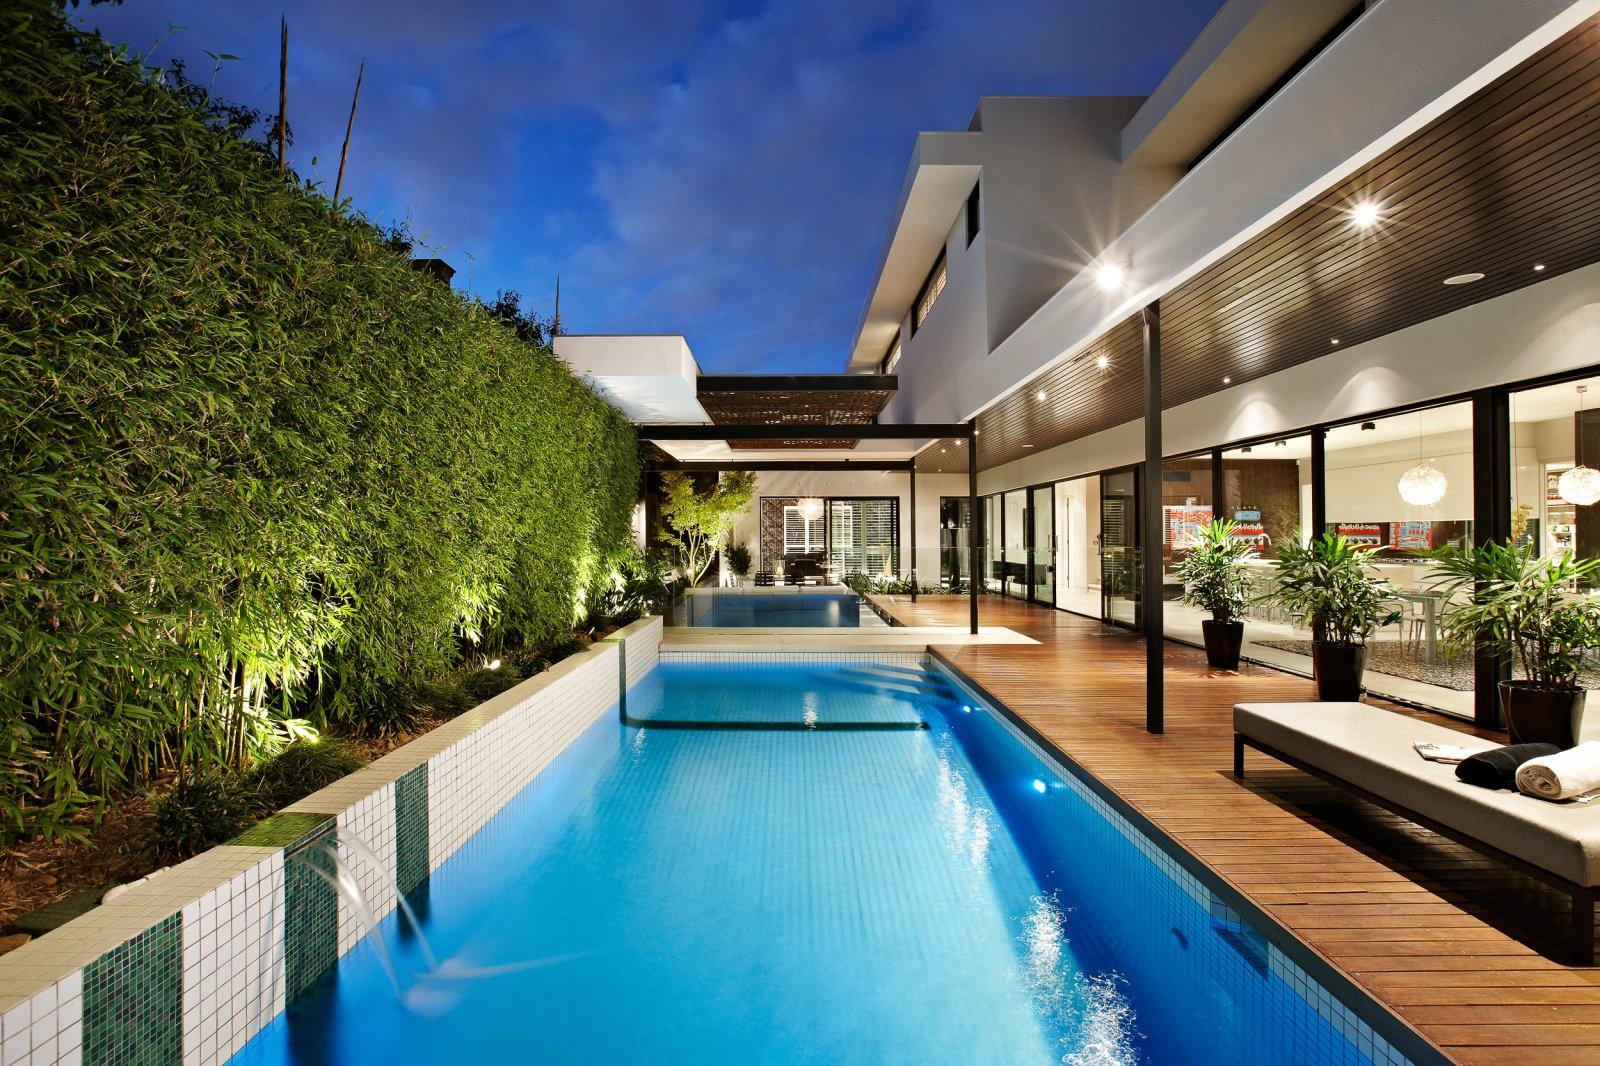 Home Www Ddbdesign Com Au